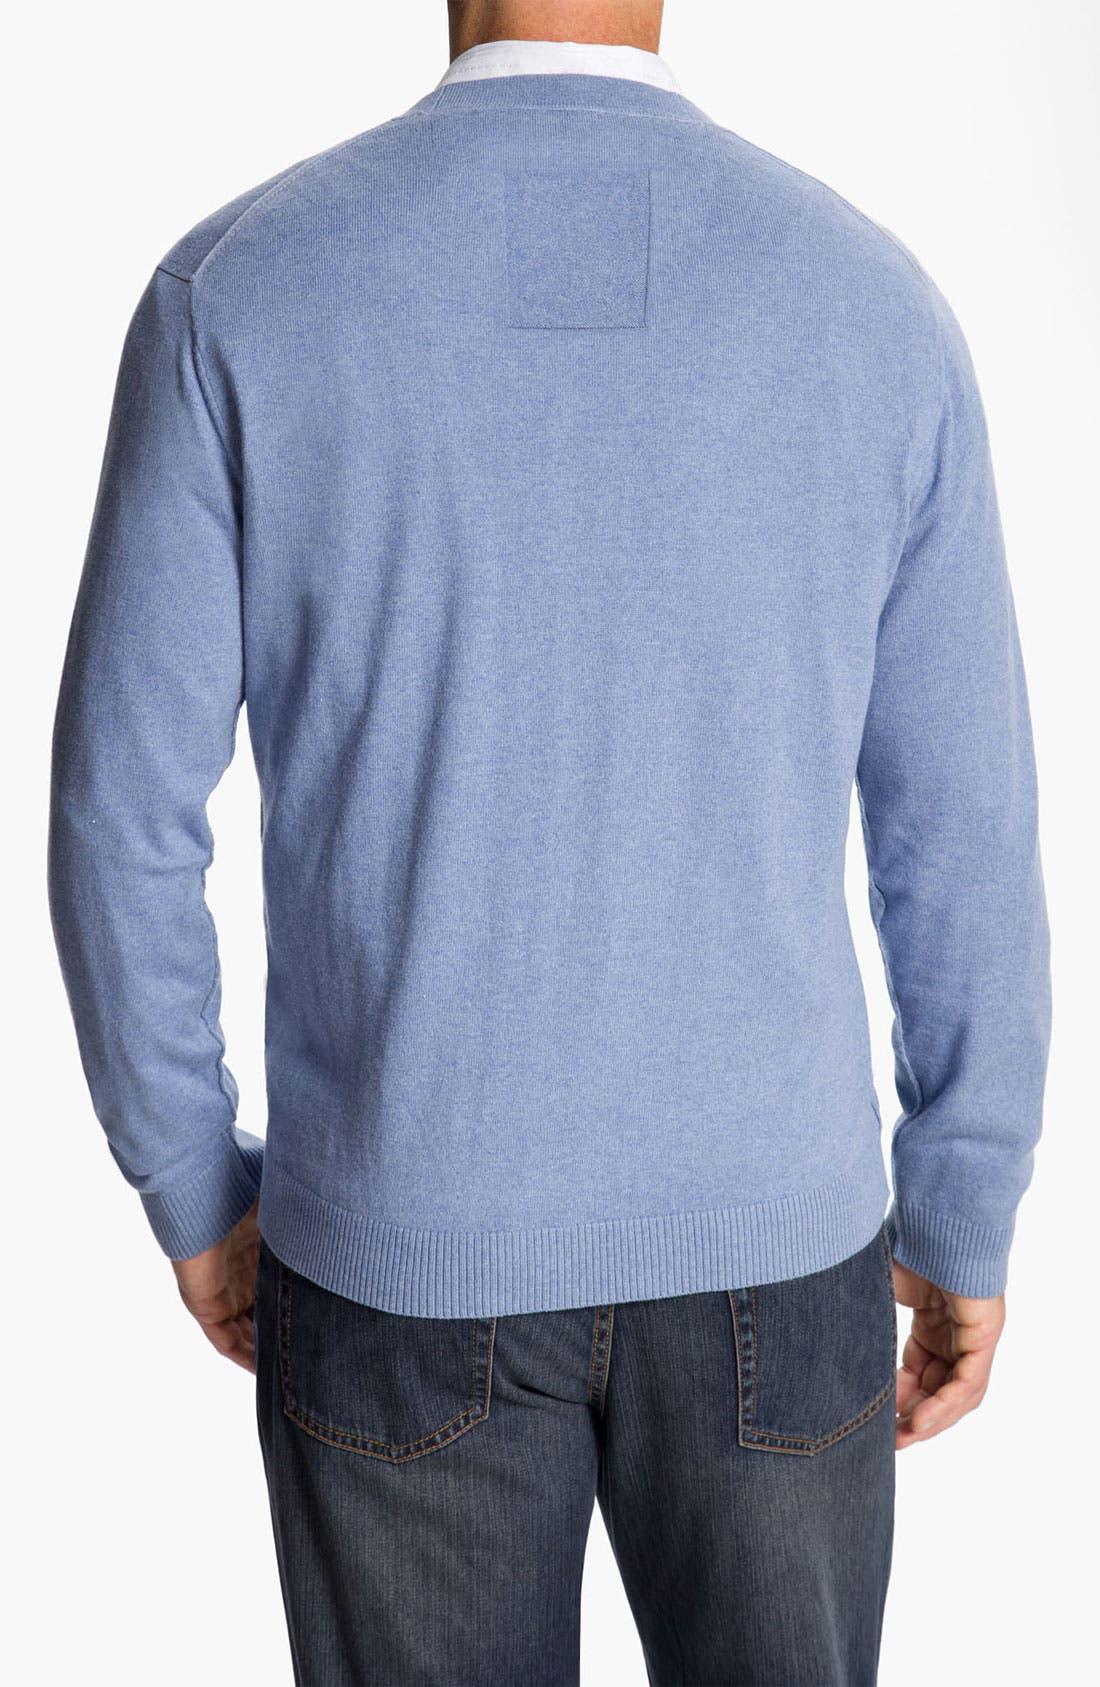 Alternate Image 2  - Tommy Bahama 'Weekend Drifter' Cotton & Cashmere Cardigan